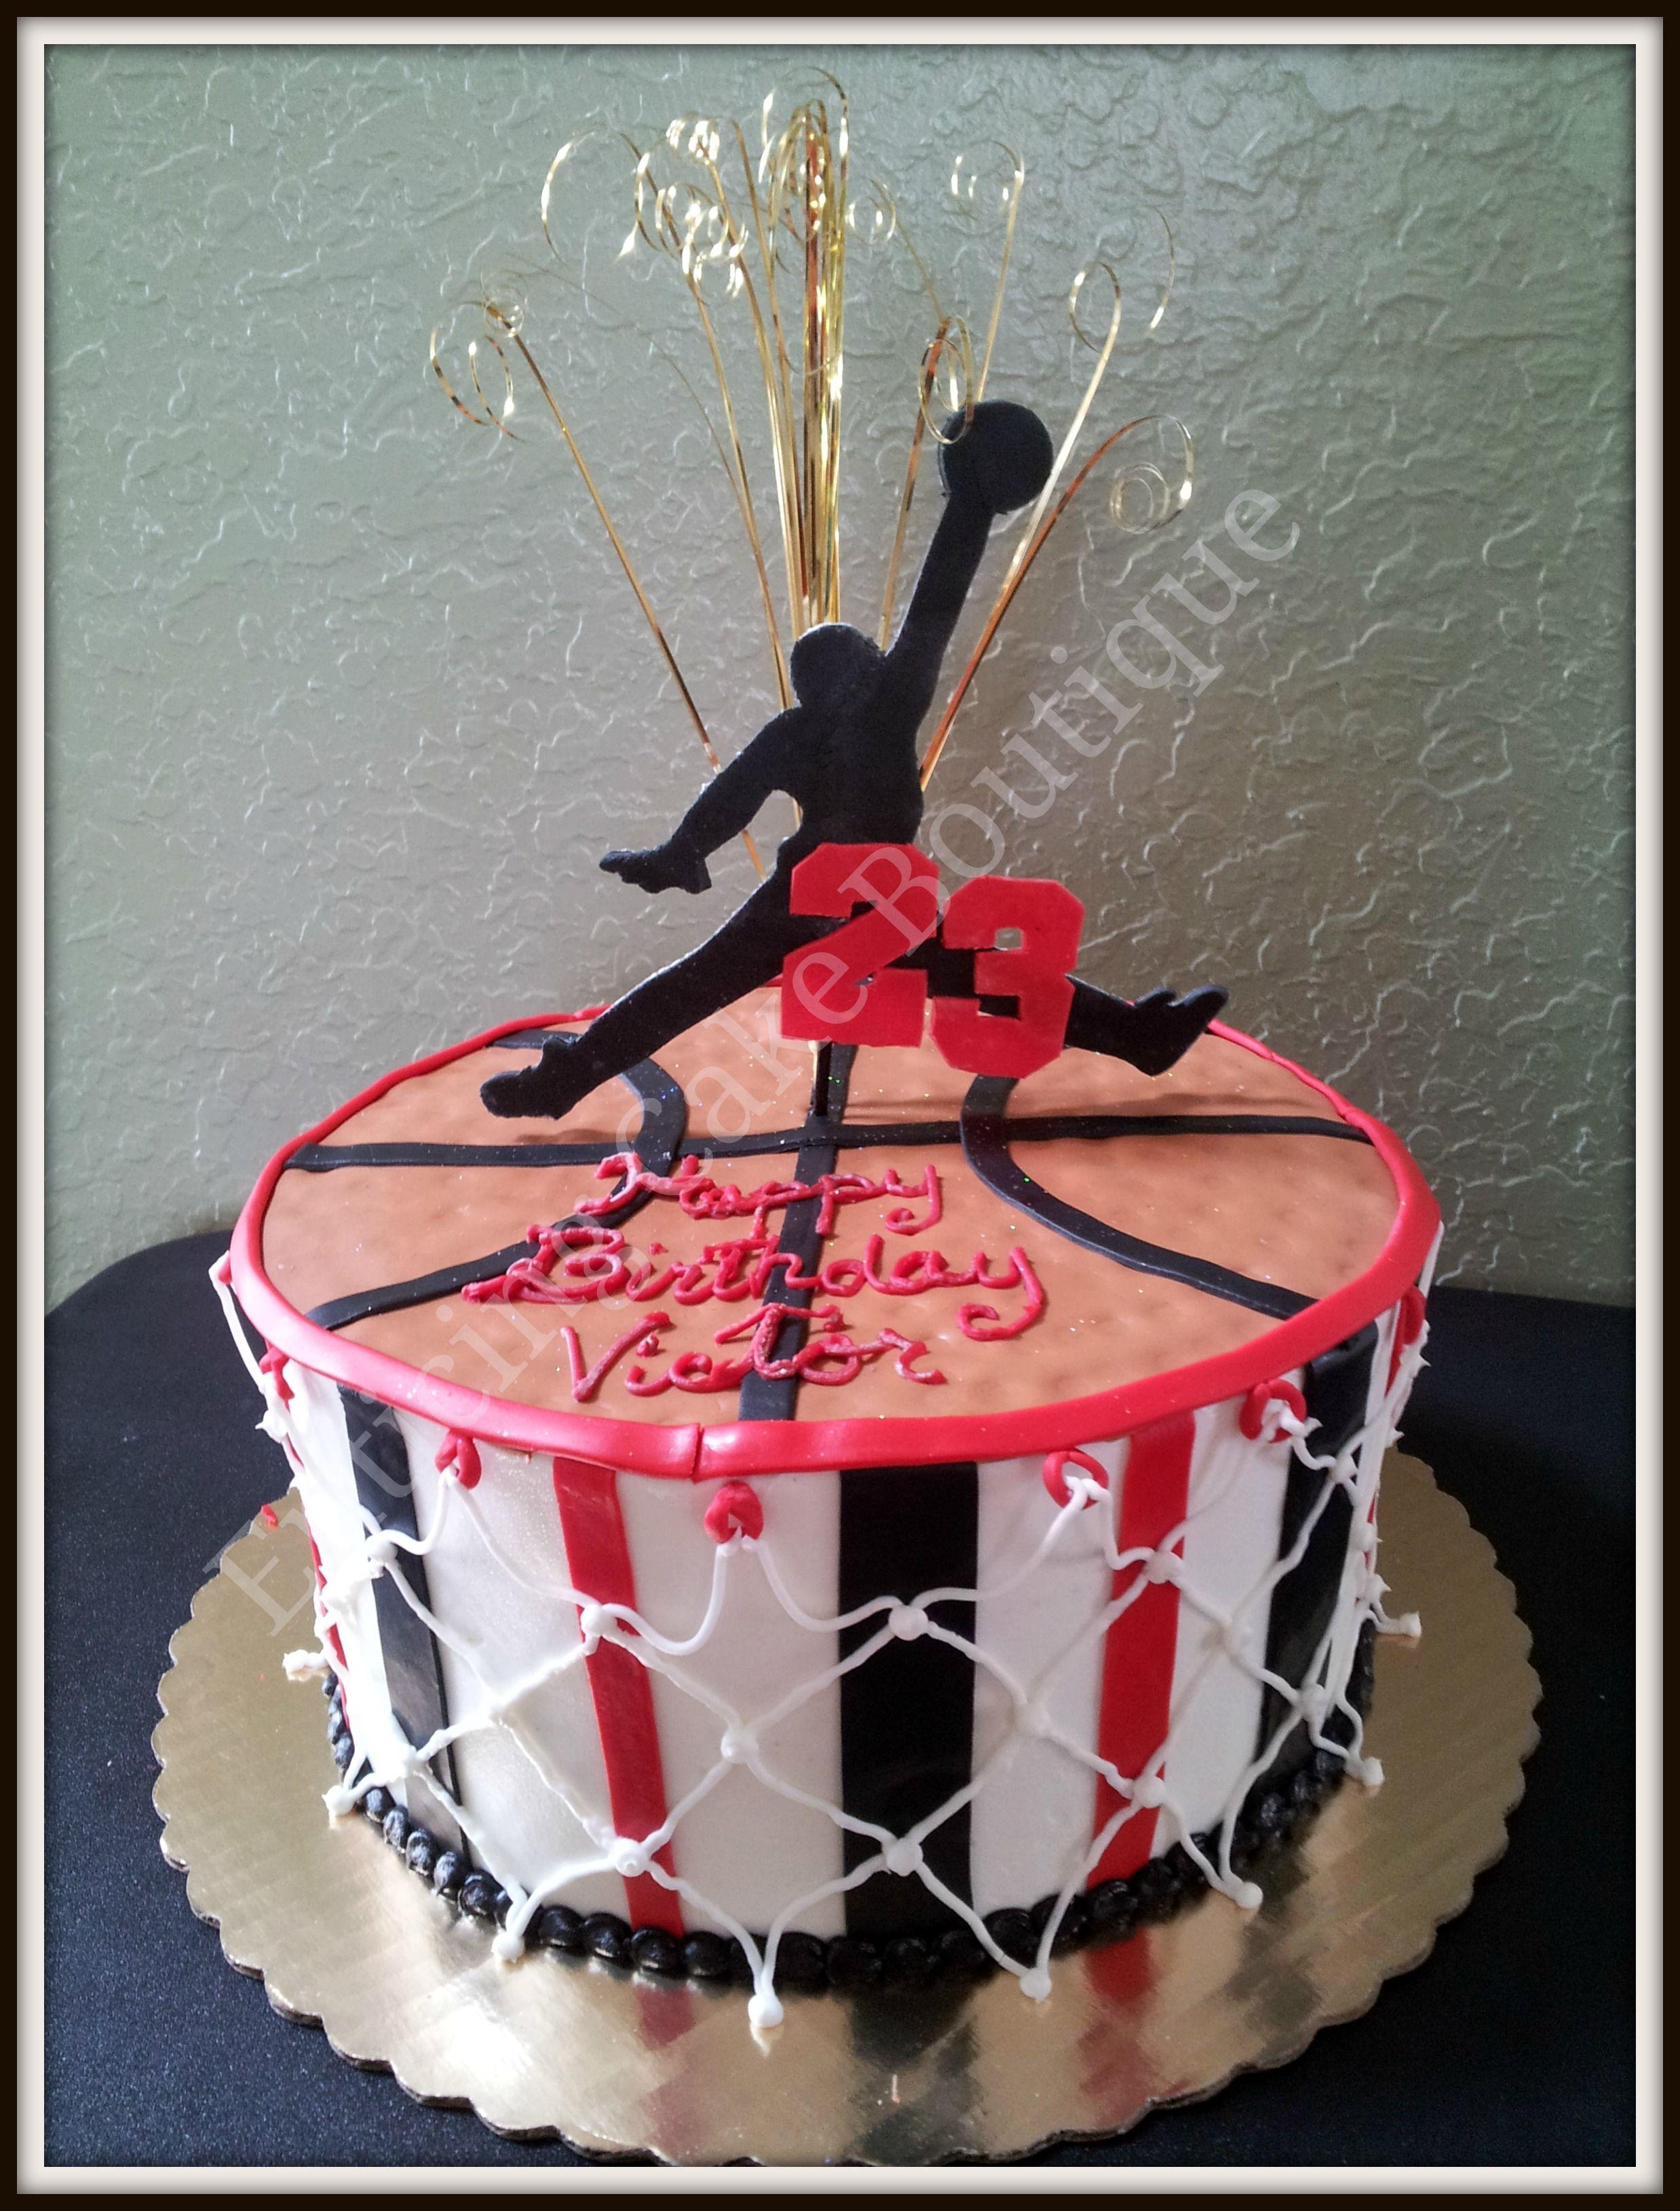 Jordan basketball birthday cake made of fondant and buttercream